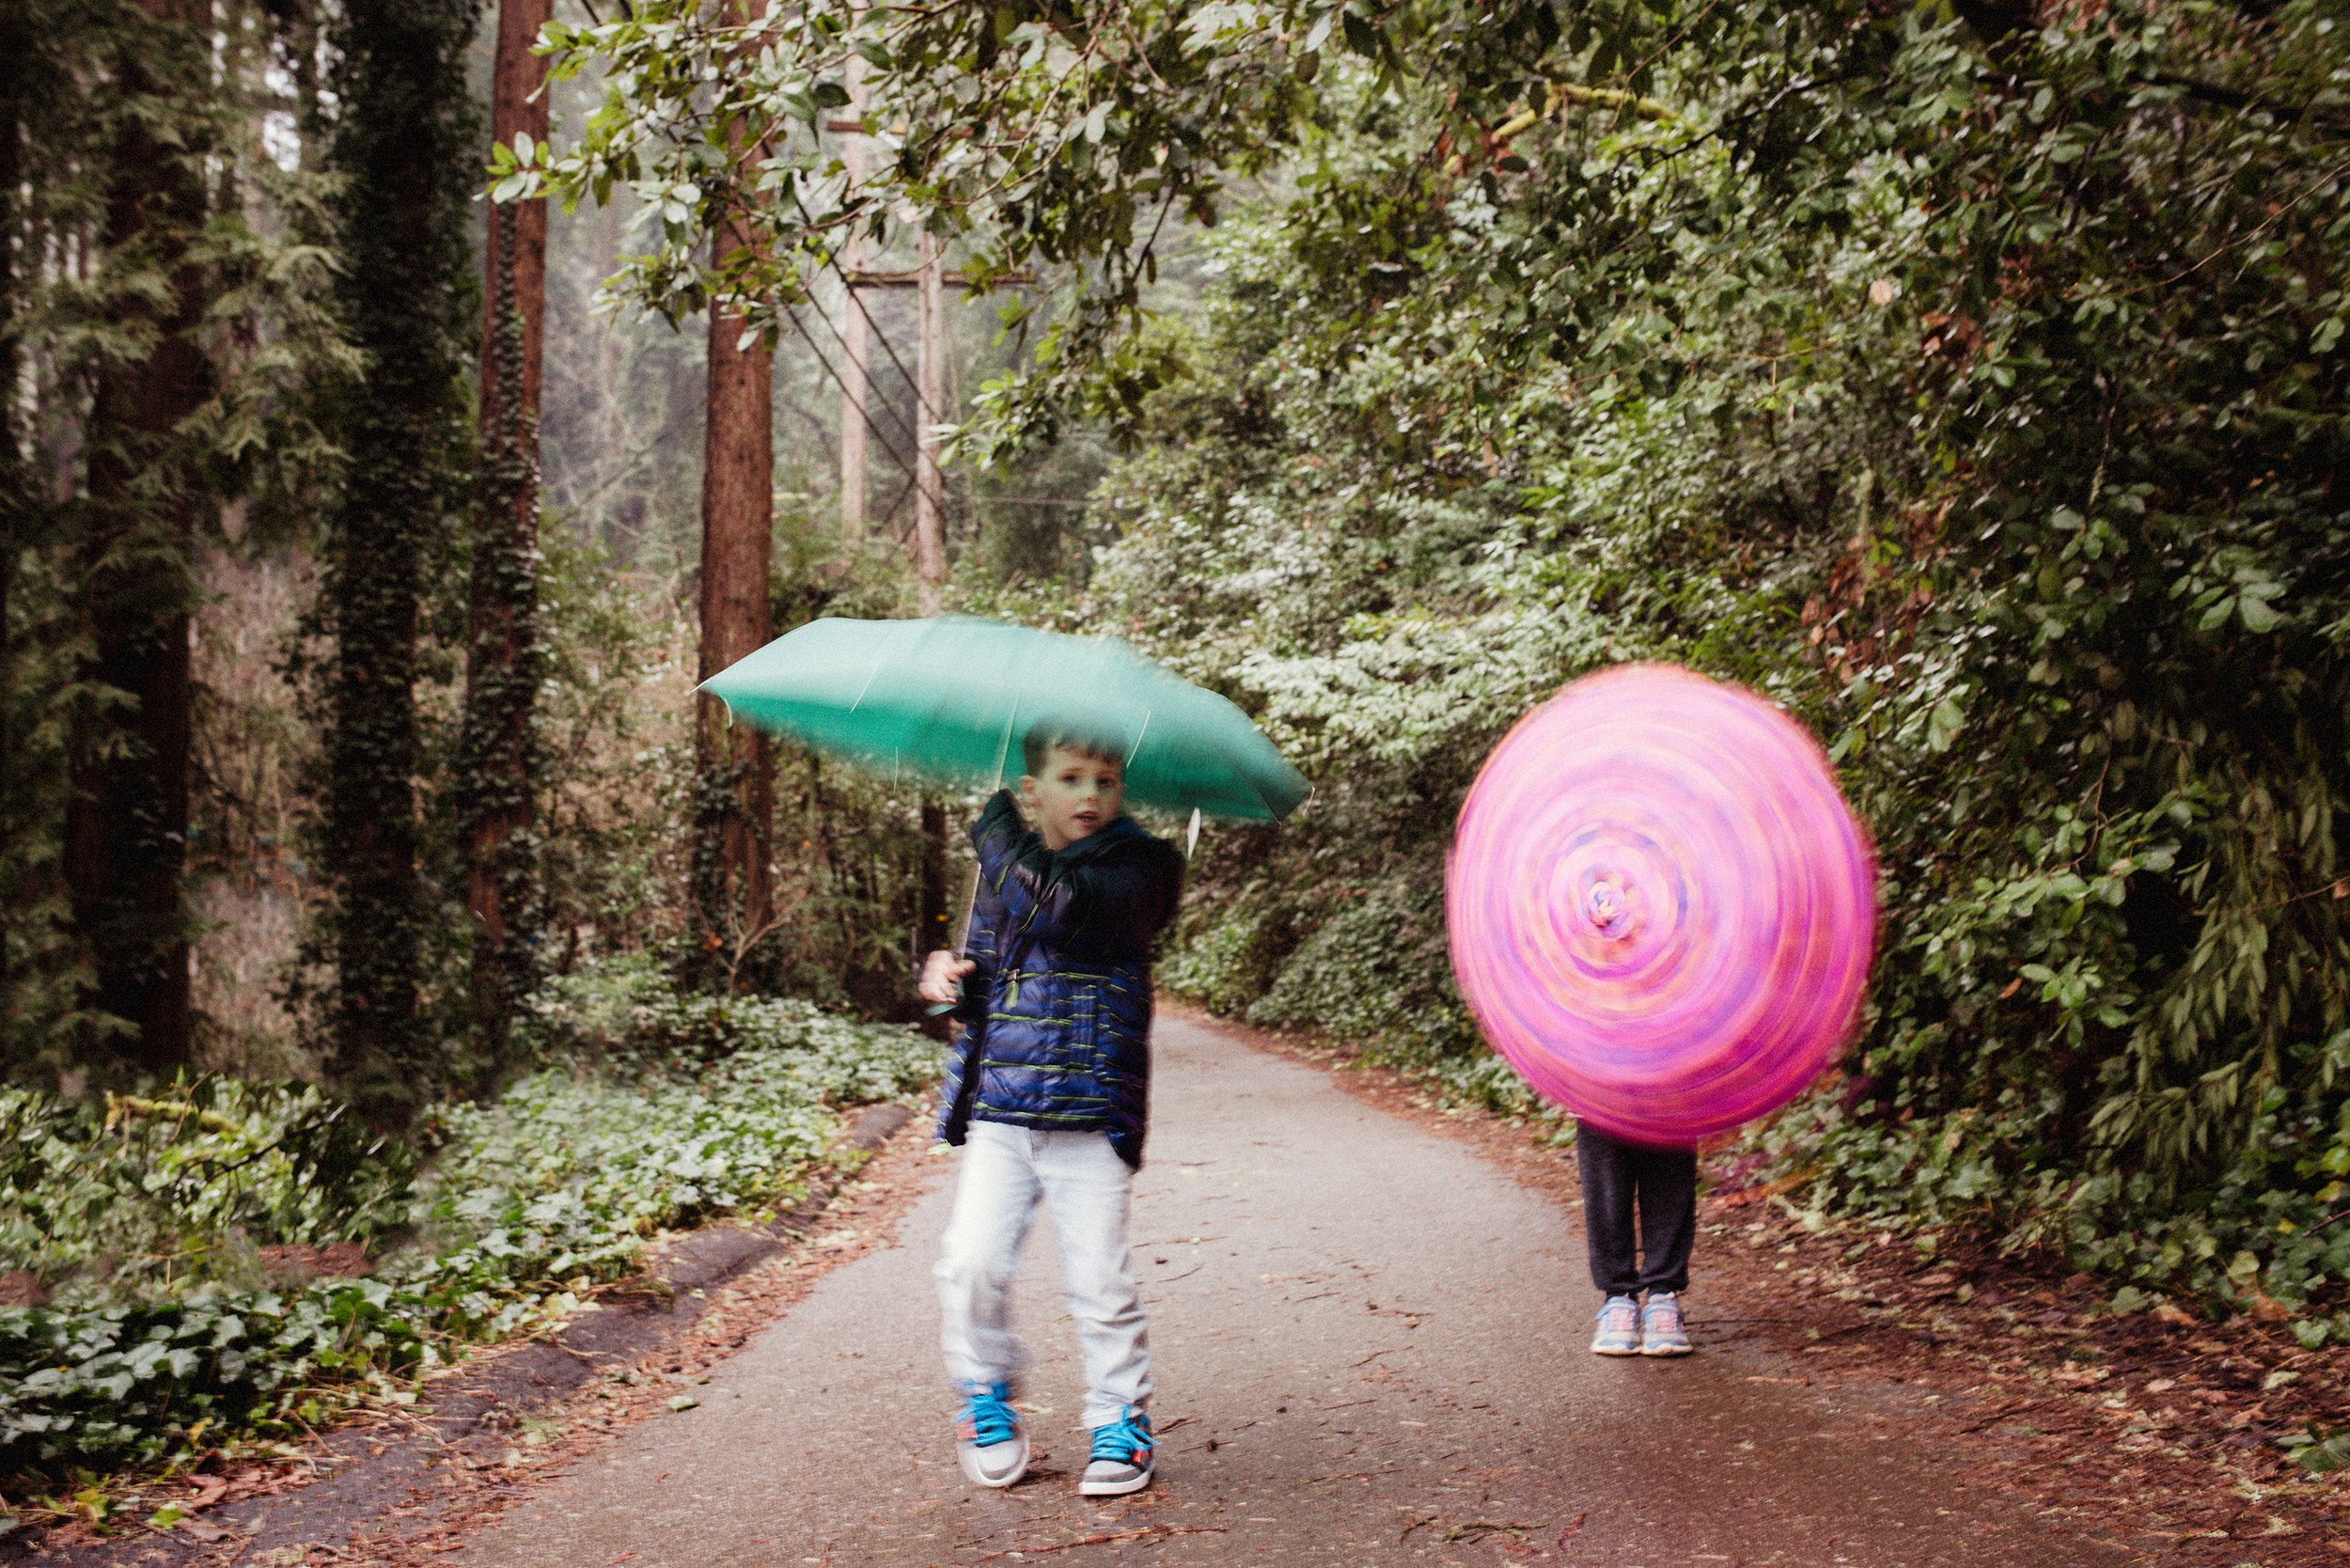 umbrellas_forest_walk (web).jpg